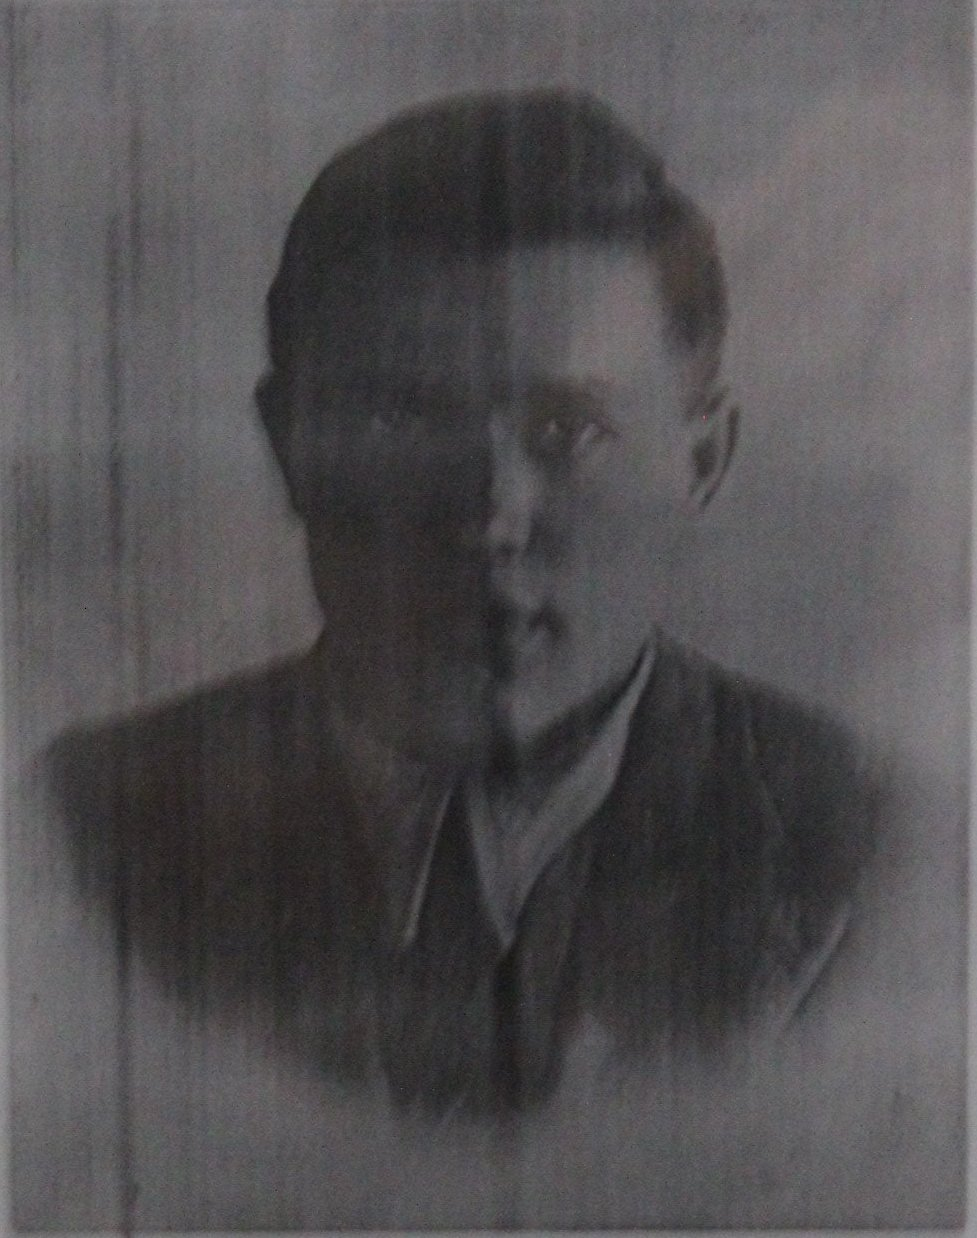 Фадеев Павел Тихонович